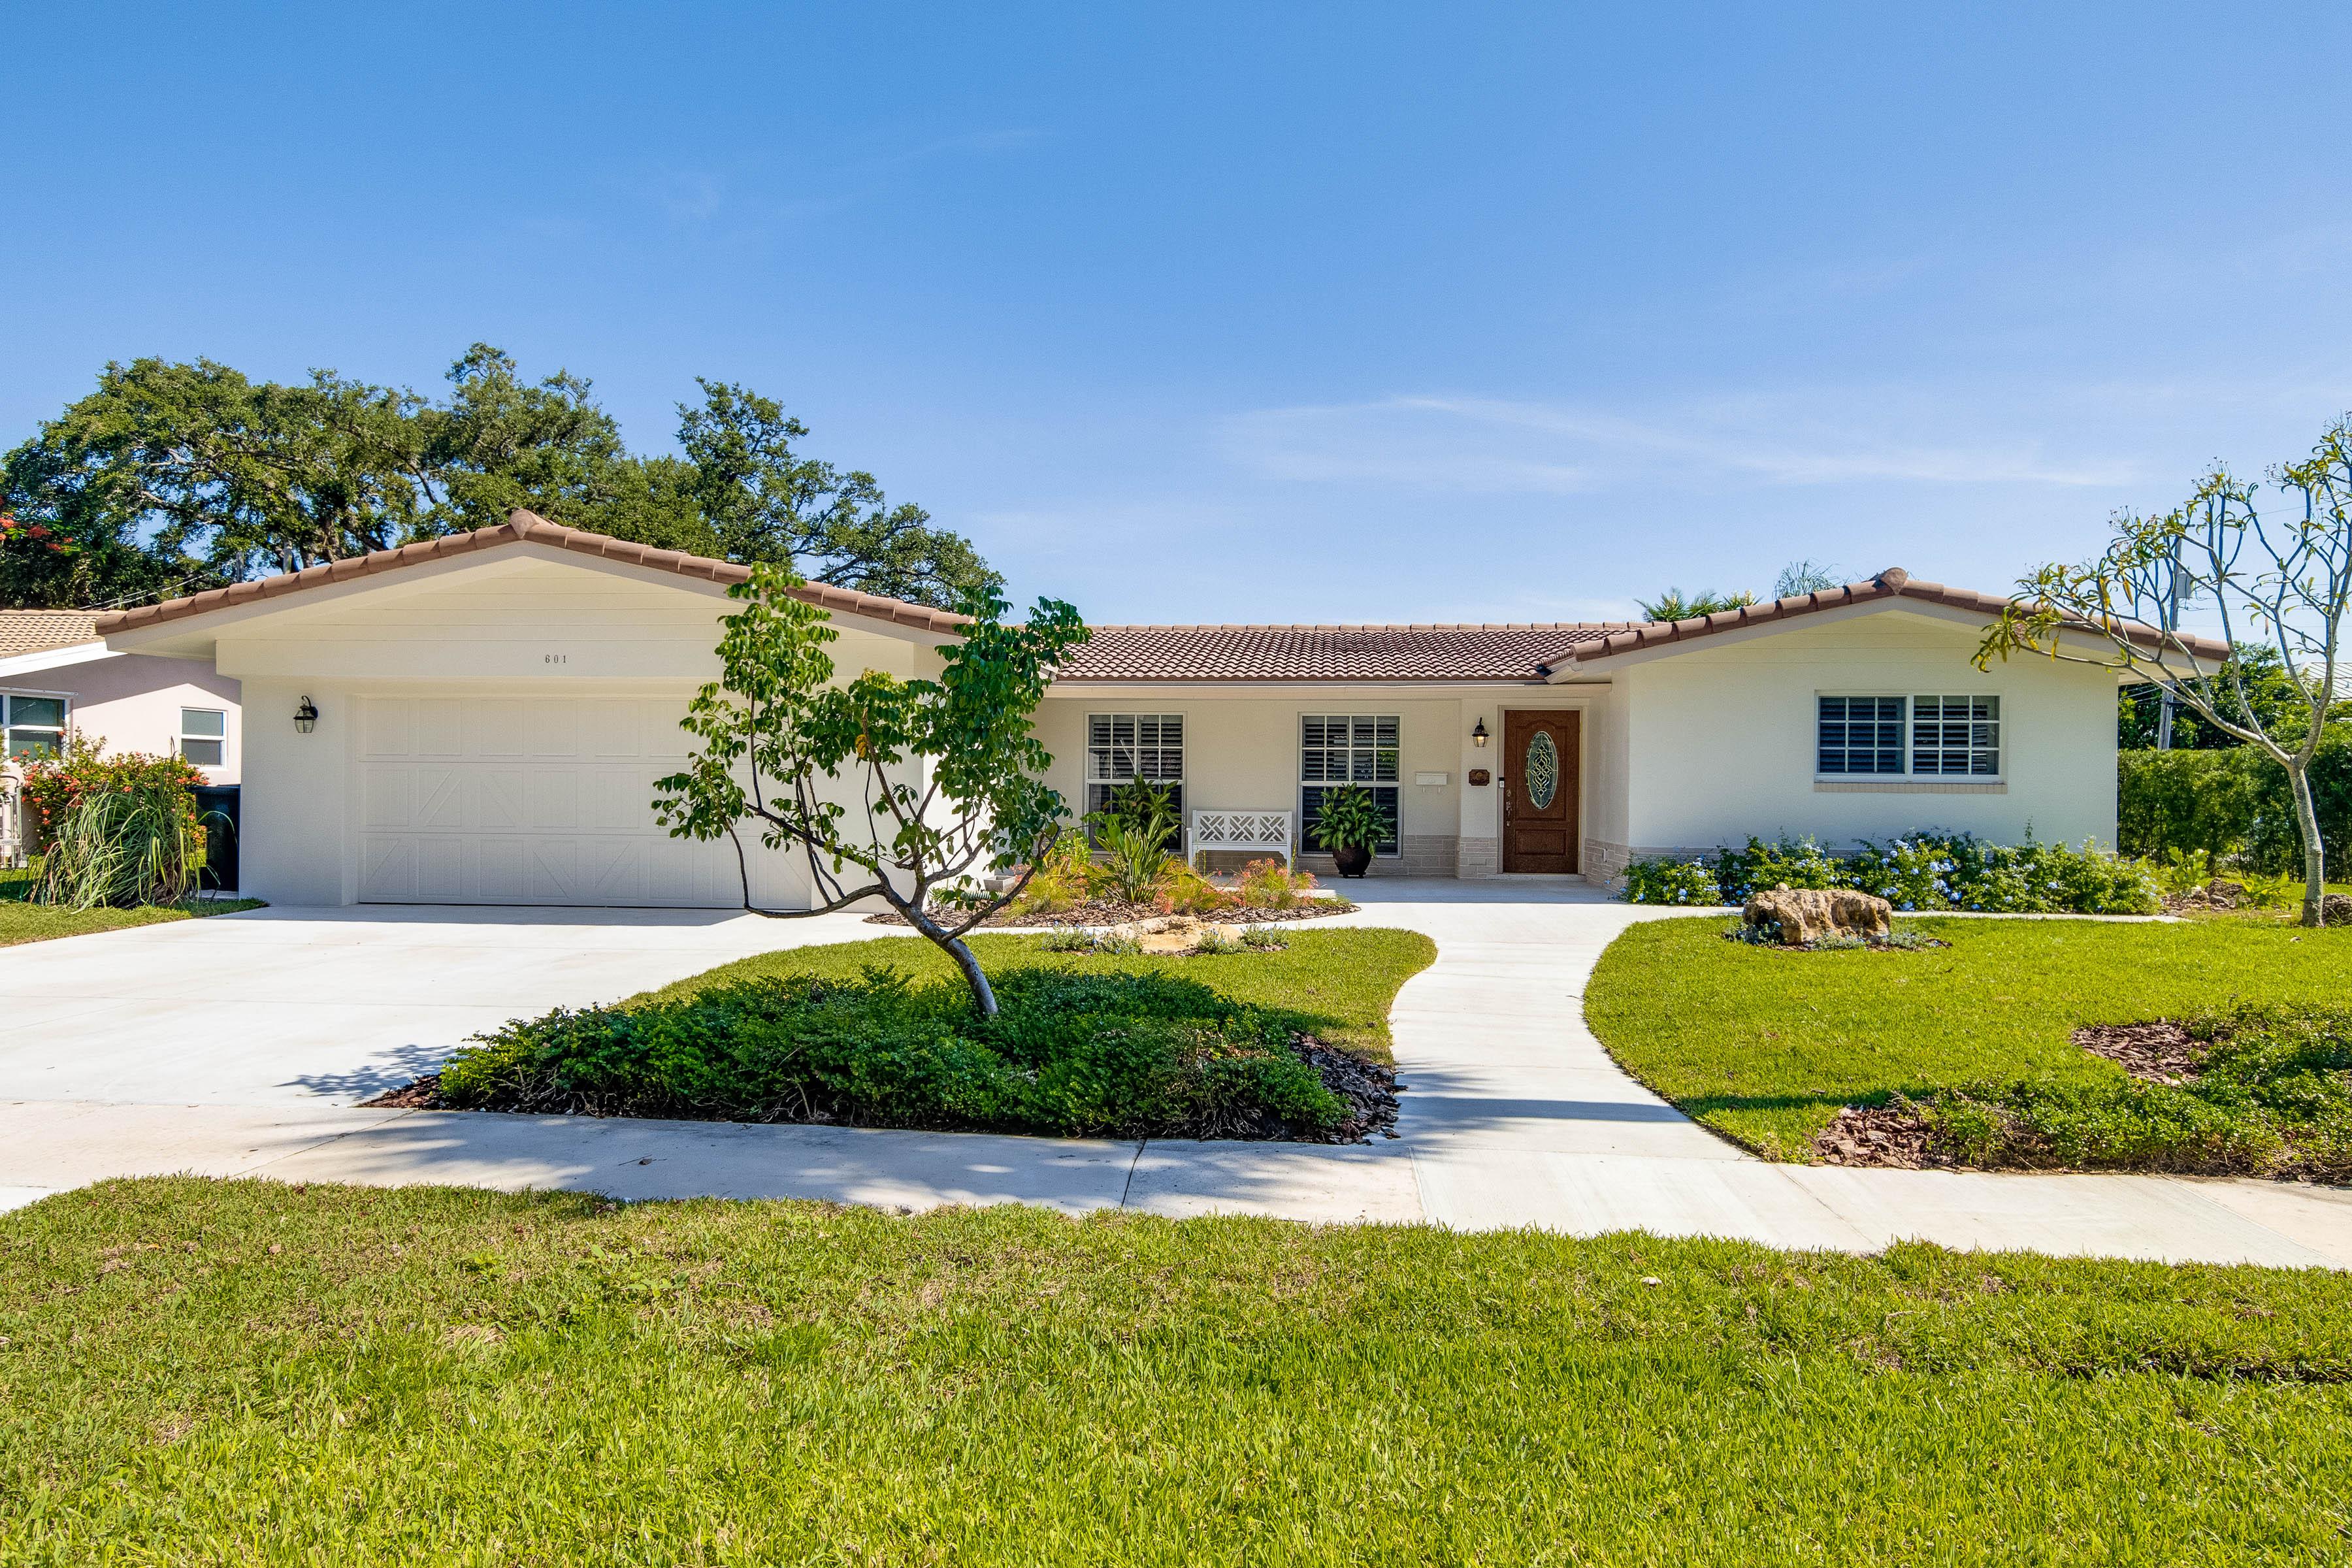 House of the Week: Boca Raton, FL